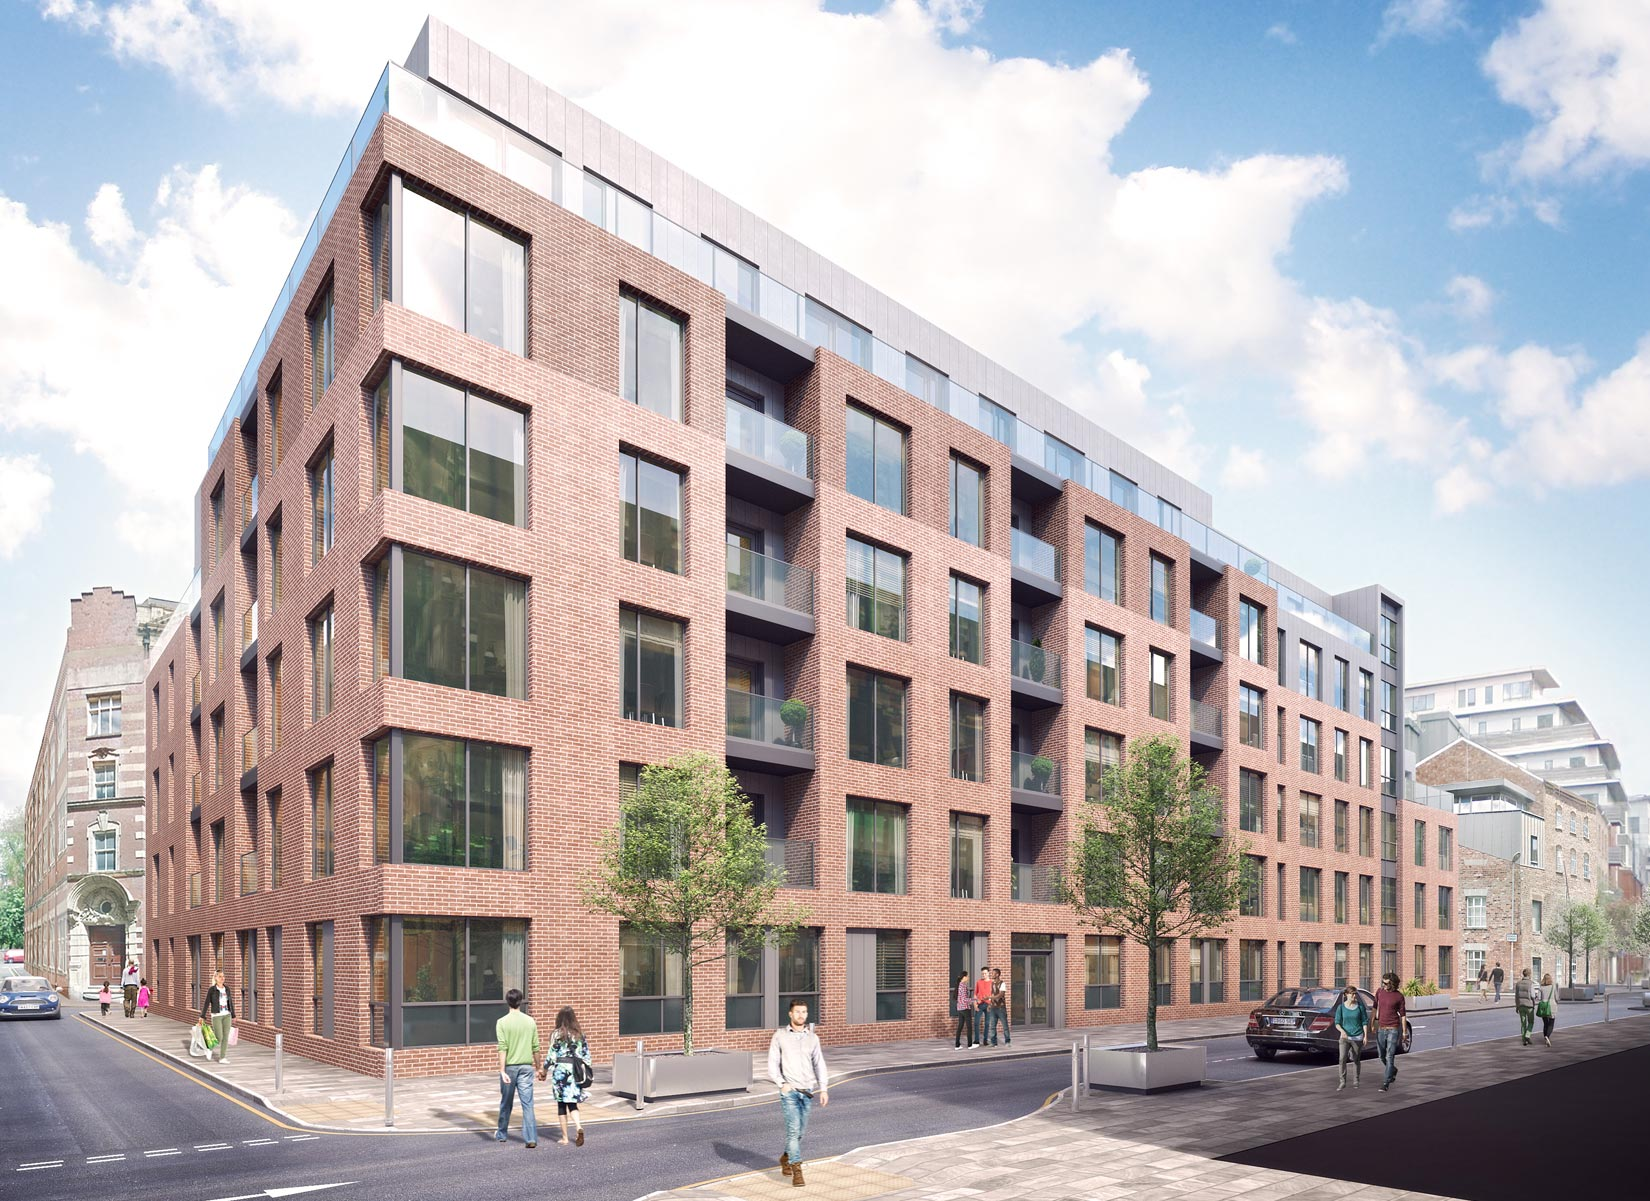 Halo, Simpson Street, Manchester, 3D Visual view towards Halo, Simpson Street